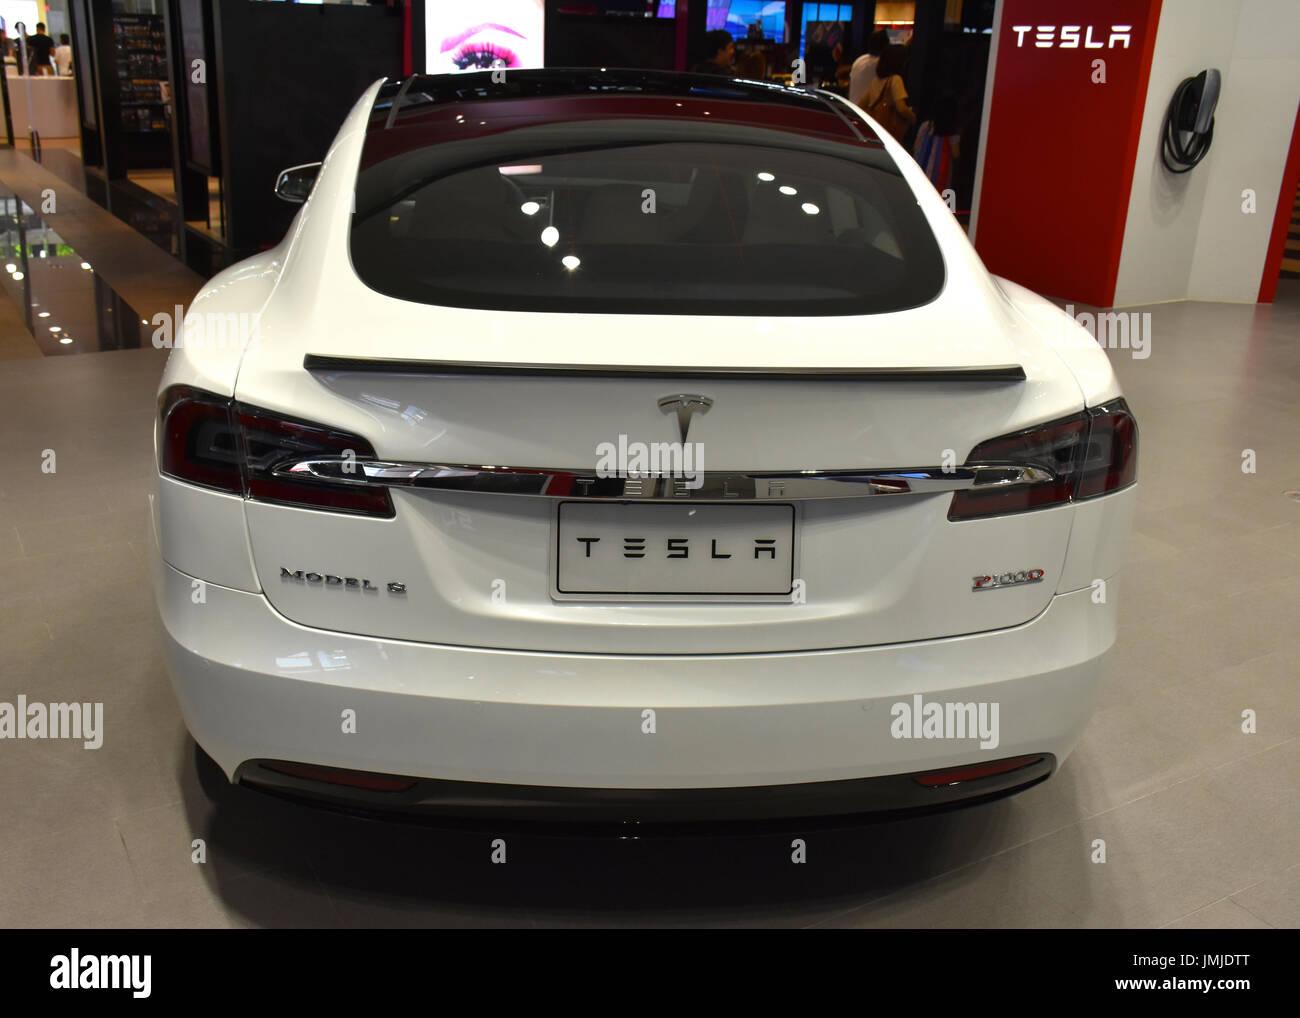 Tesla The Band Stock Photos Tesla The Band Stock Images Alamy # Tefla Muebles Sl